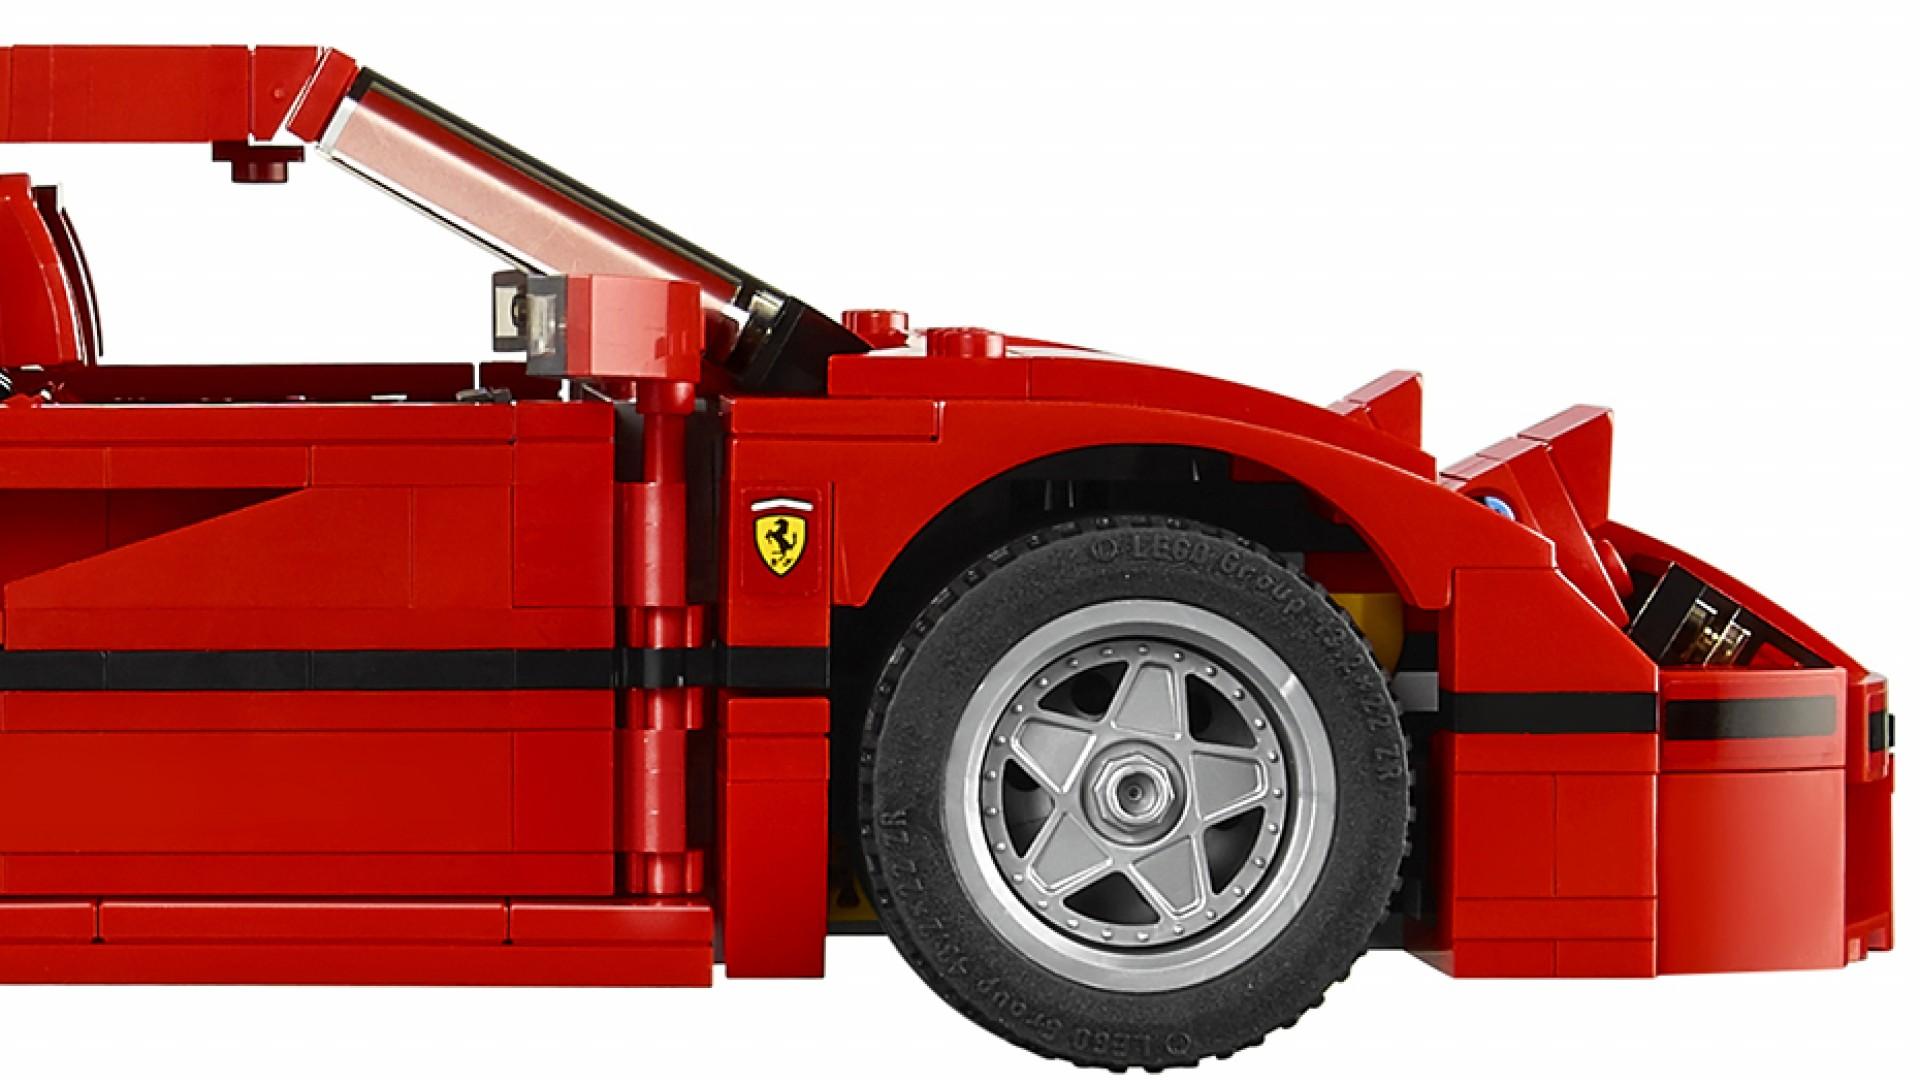 lego 39 s ferrari f40 supercar set has got us feeling like a big kid square mile. Black Bedroom Furniture Sets. Home Design Ideas